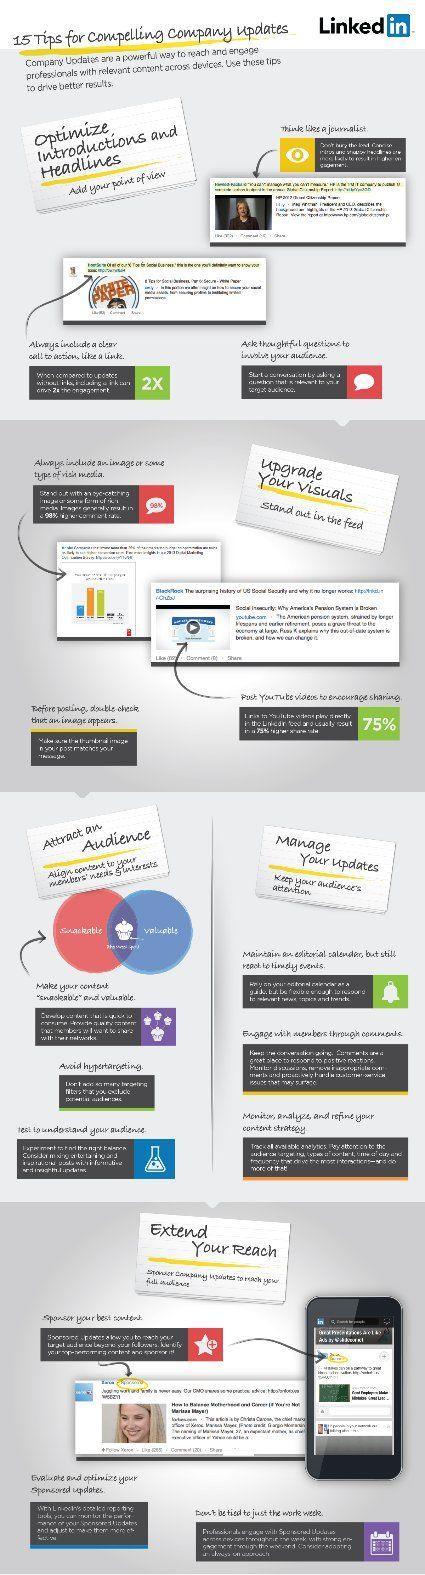 123 best All things LinkedIn! images on Pinterest Social media - best of blueprint software systems linkedin